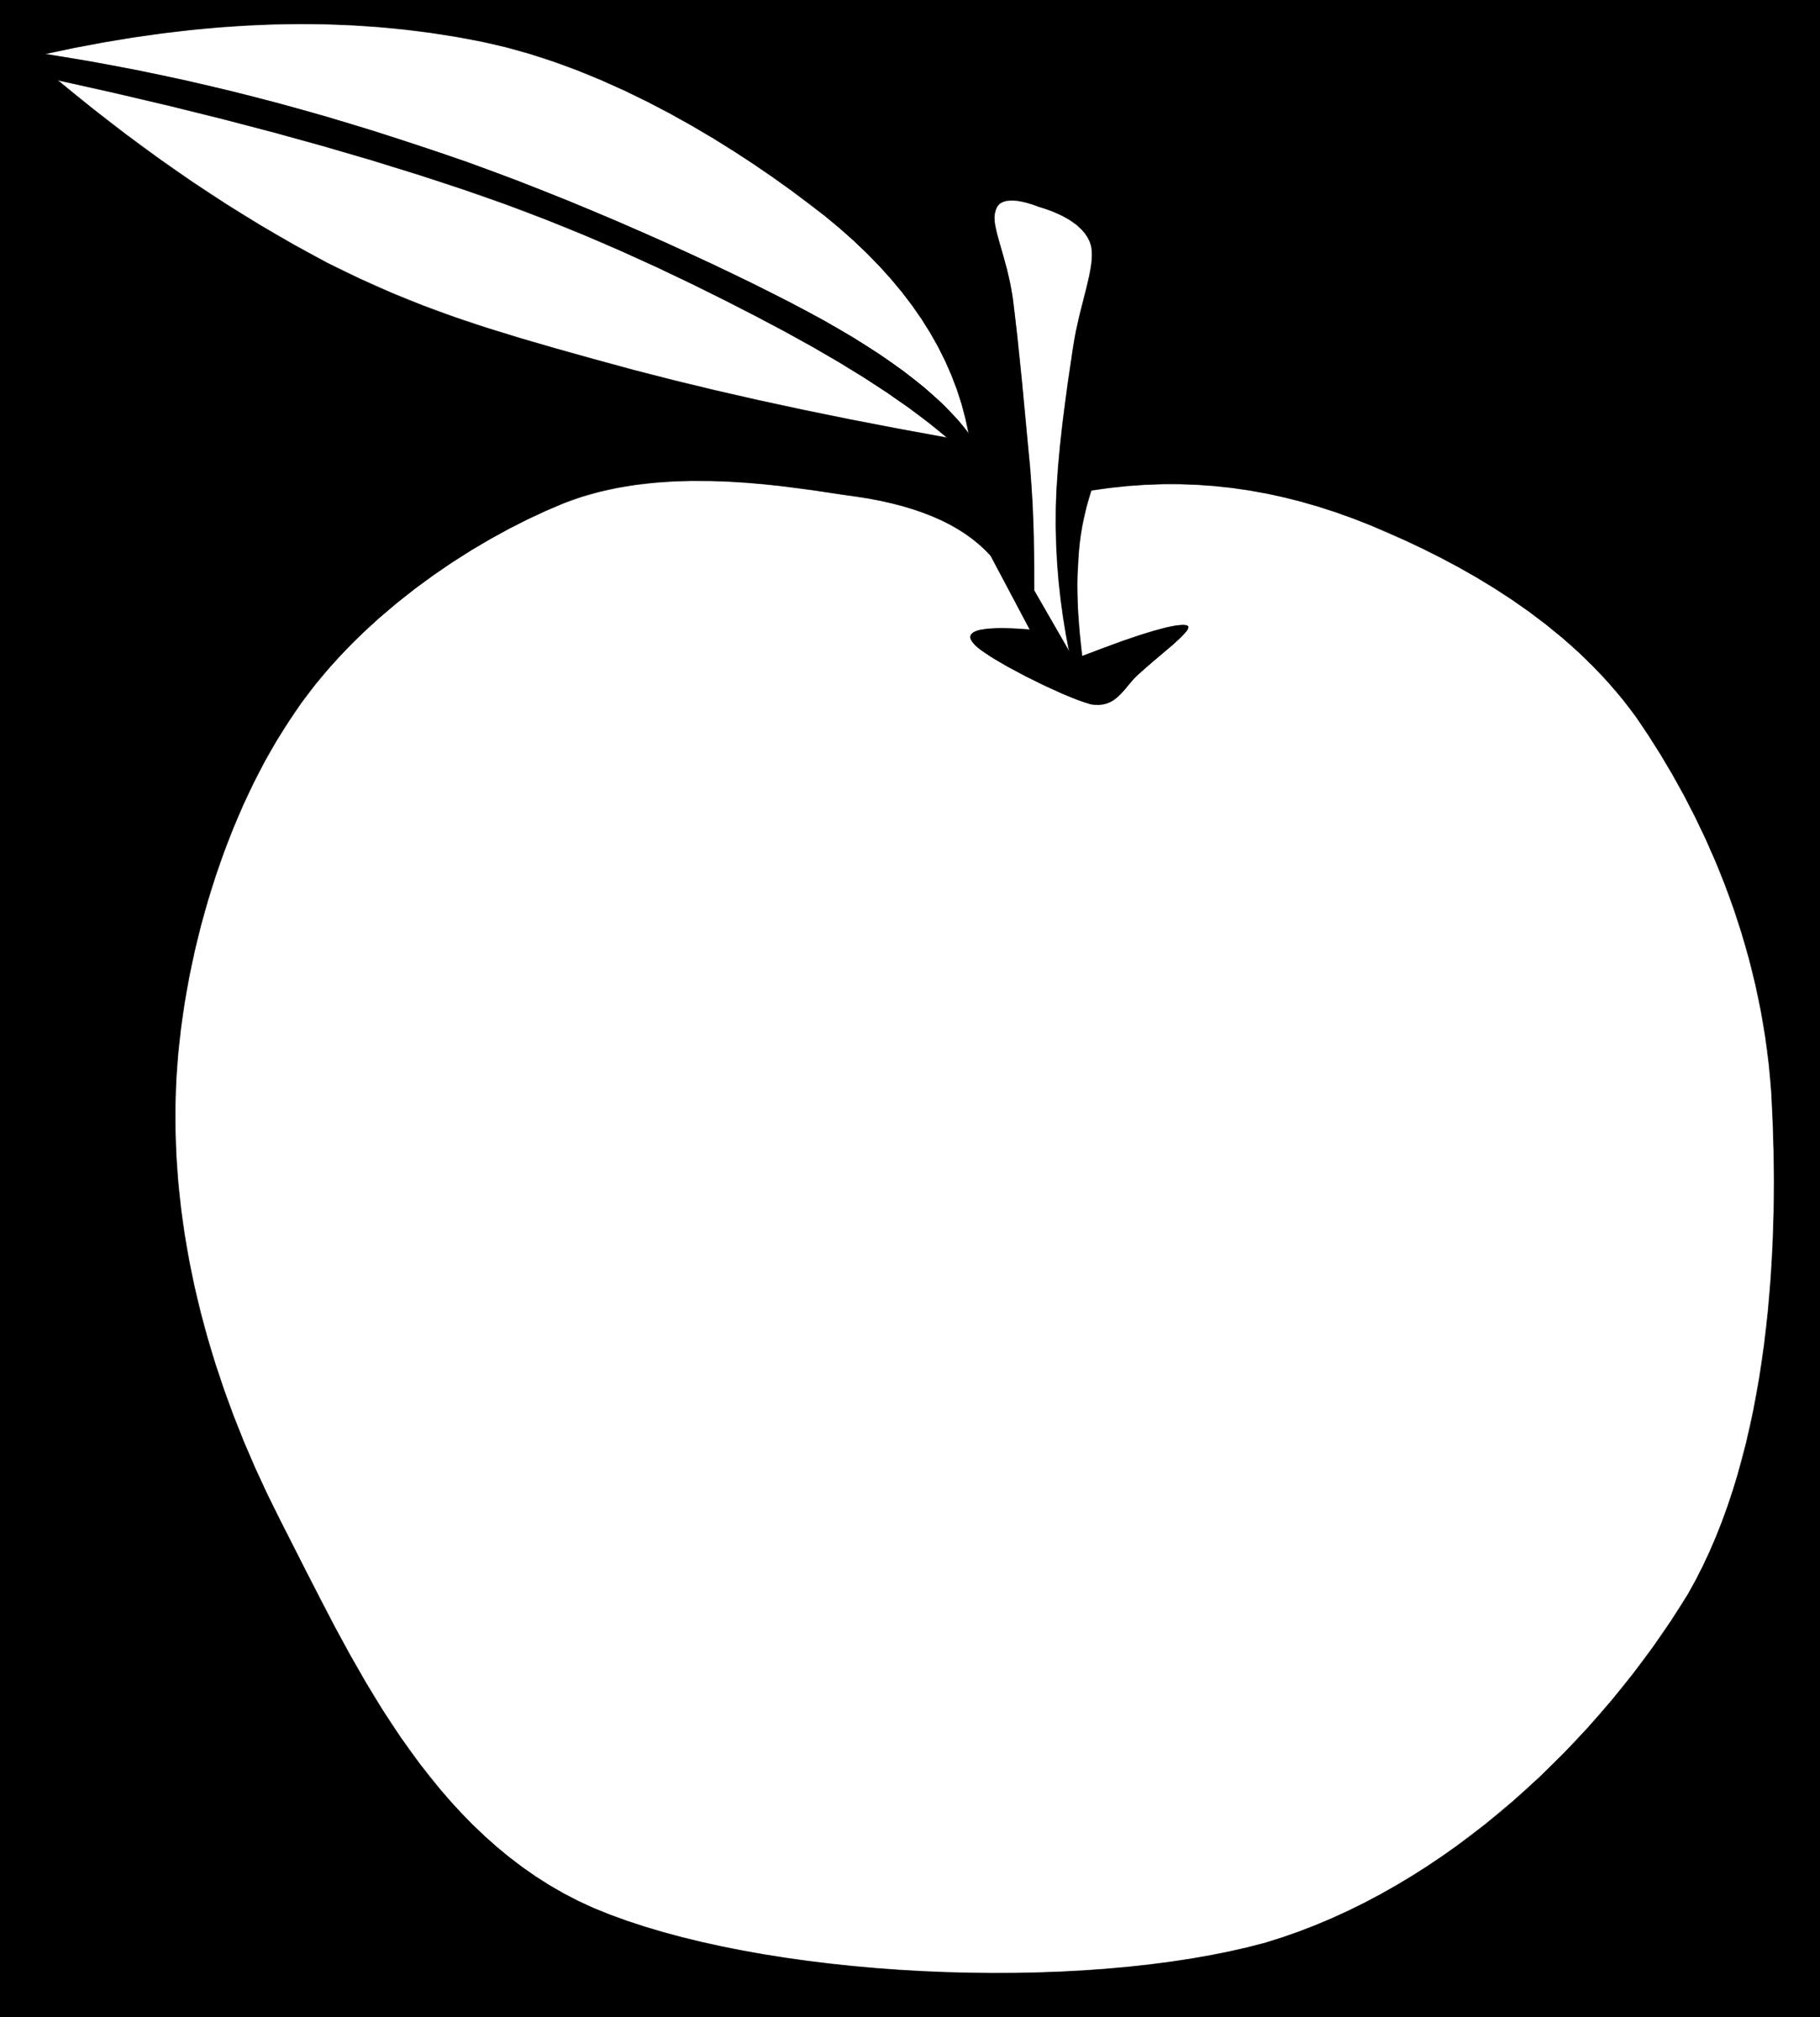 Pie clipart border. Simple fruit apple big